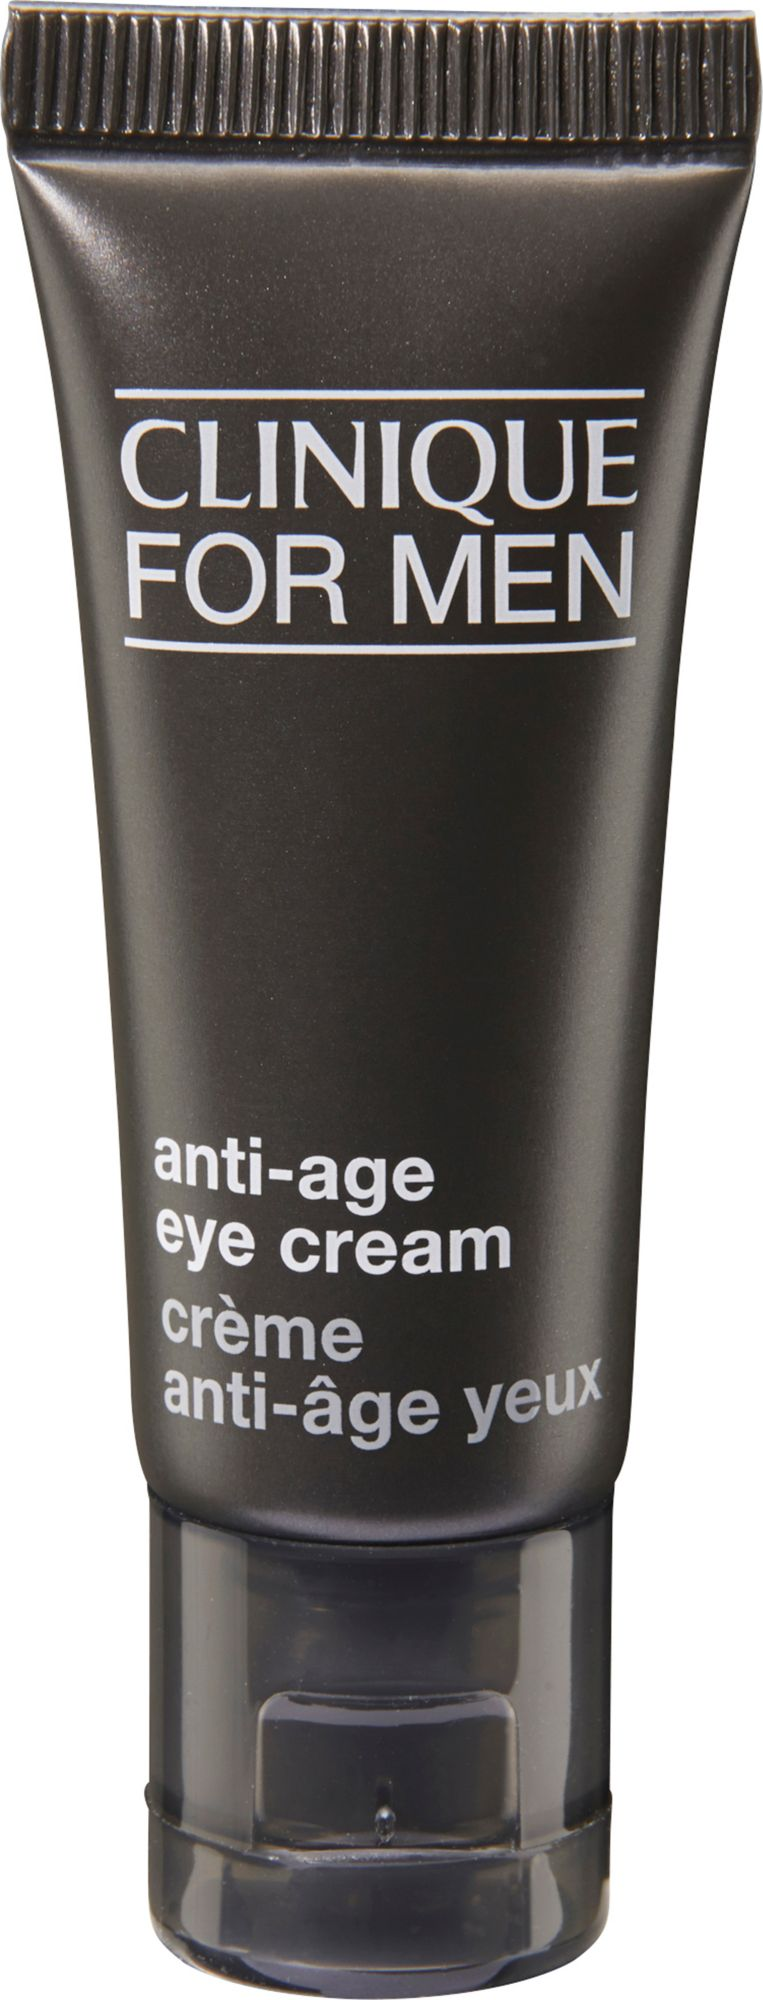 CLINIQUE Clinique, »Anti-Age Eye Cream«, Augencreme